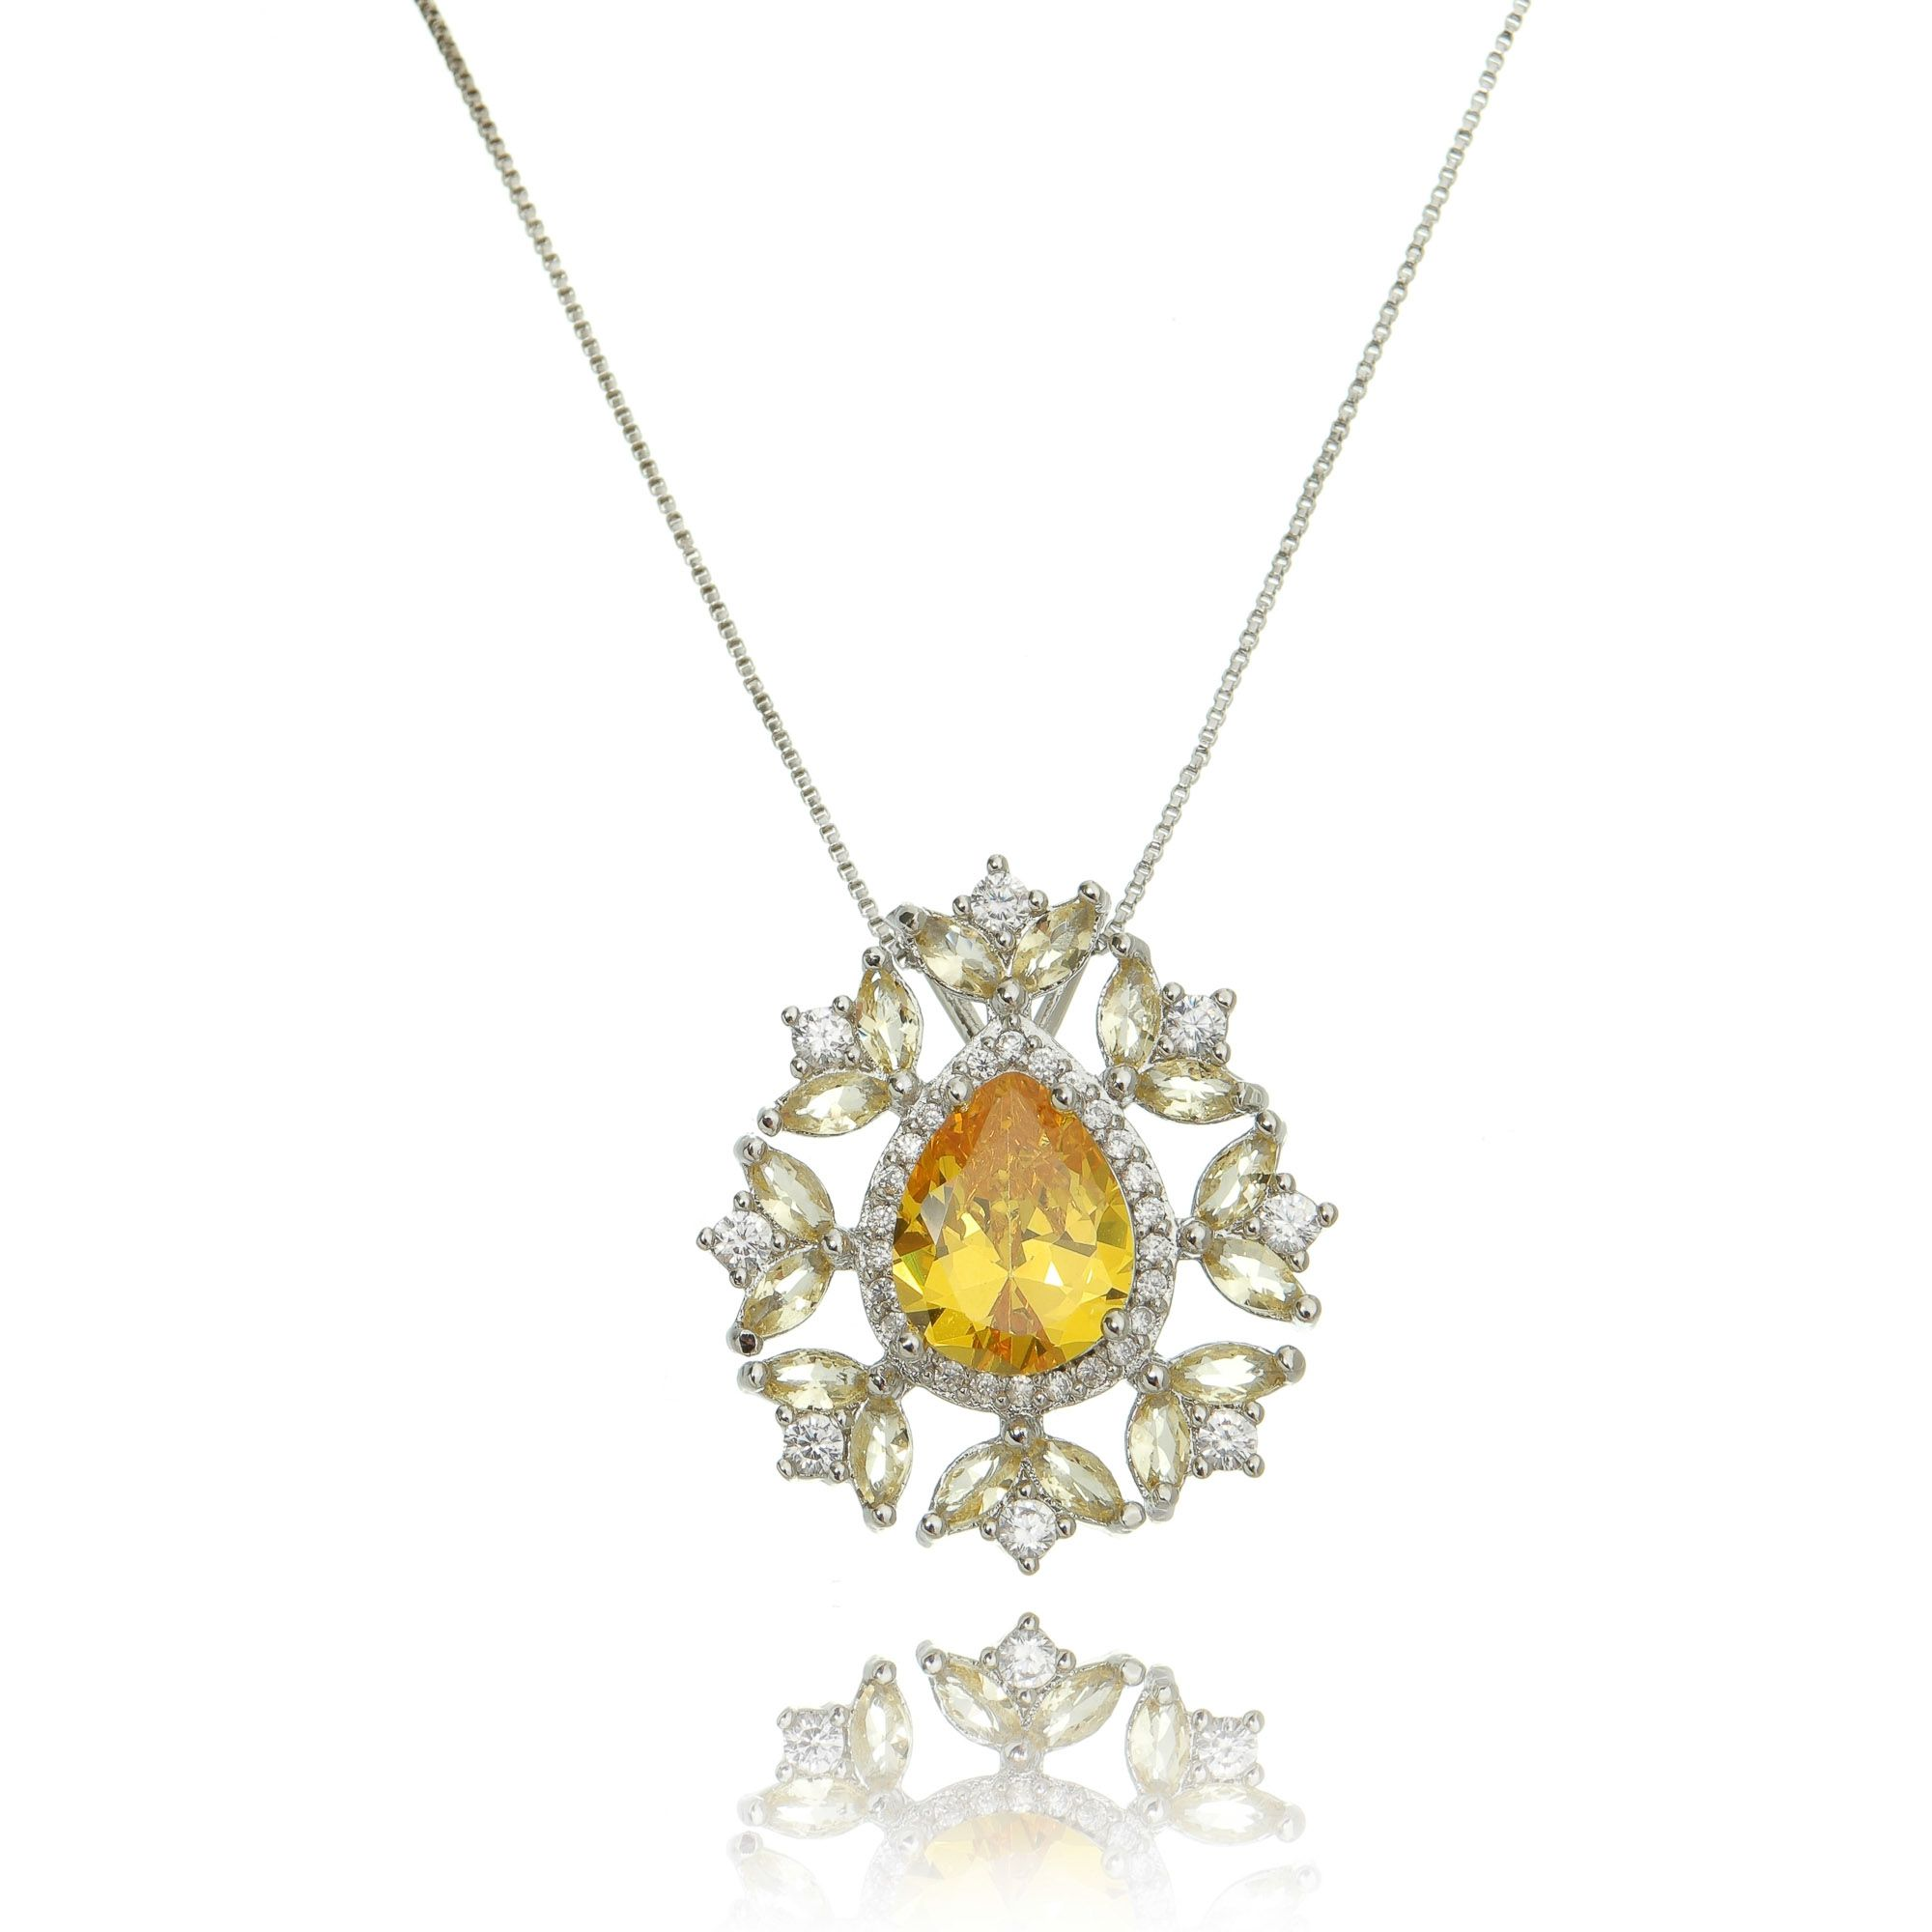 Colar Pingente de Gota Amarela e Zircônia Cristal Semijoia Luxo Ródio Branco  - Soloyou